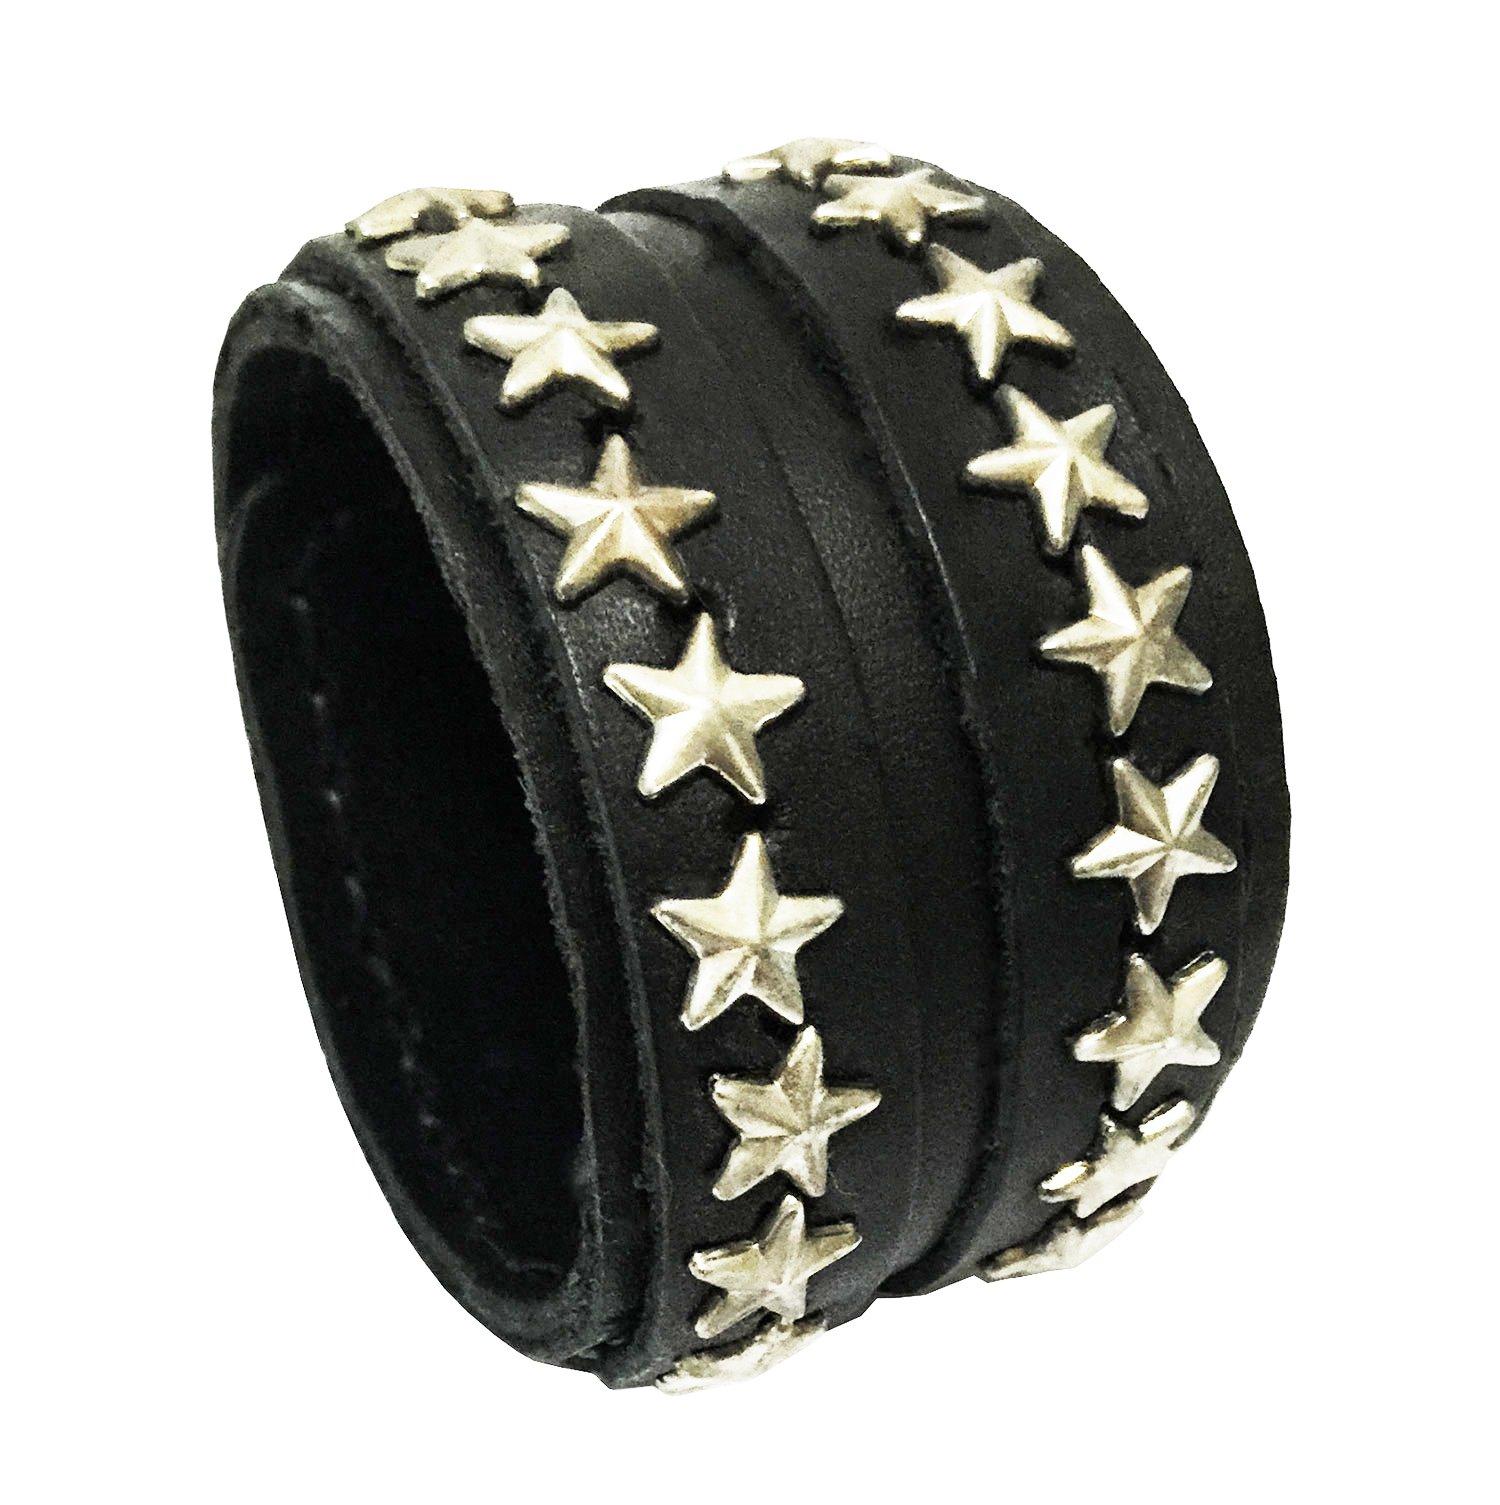 D'SHARK 1.8'' Wide Double Layer Stars Design Biker Leather Cuff Bracelet Wristband for Unisex (Black)